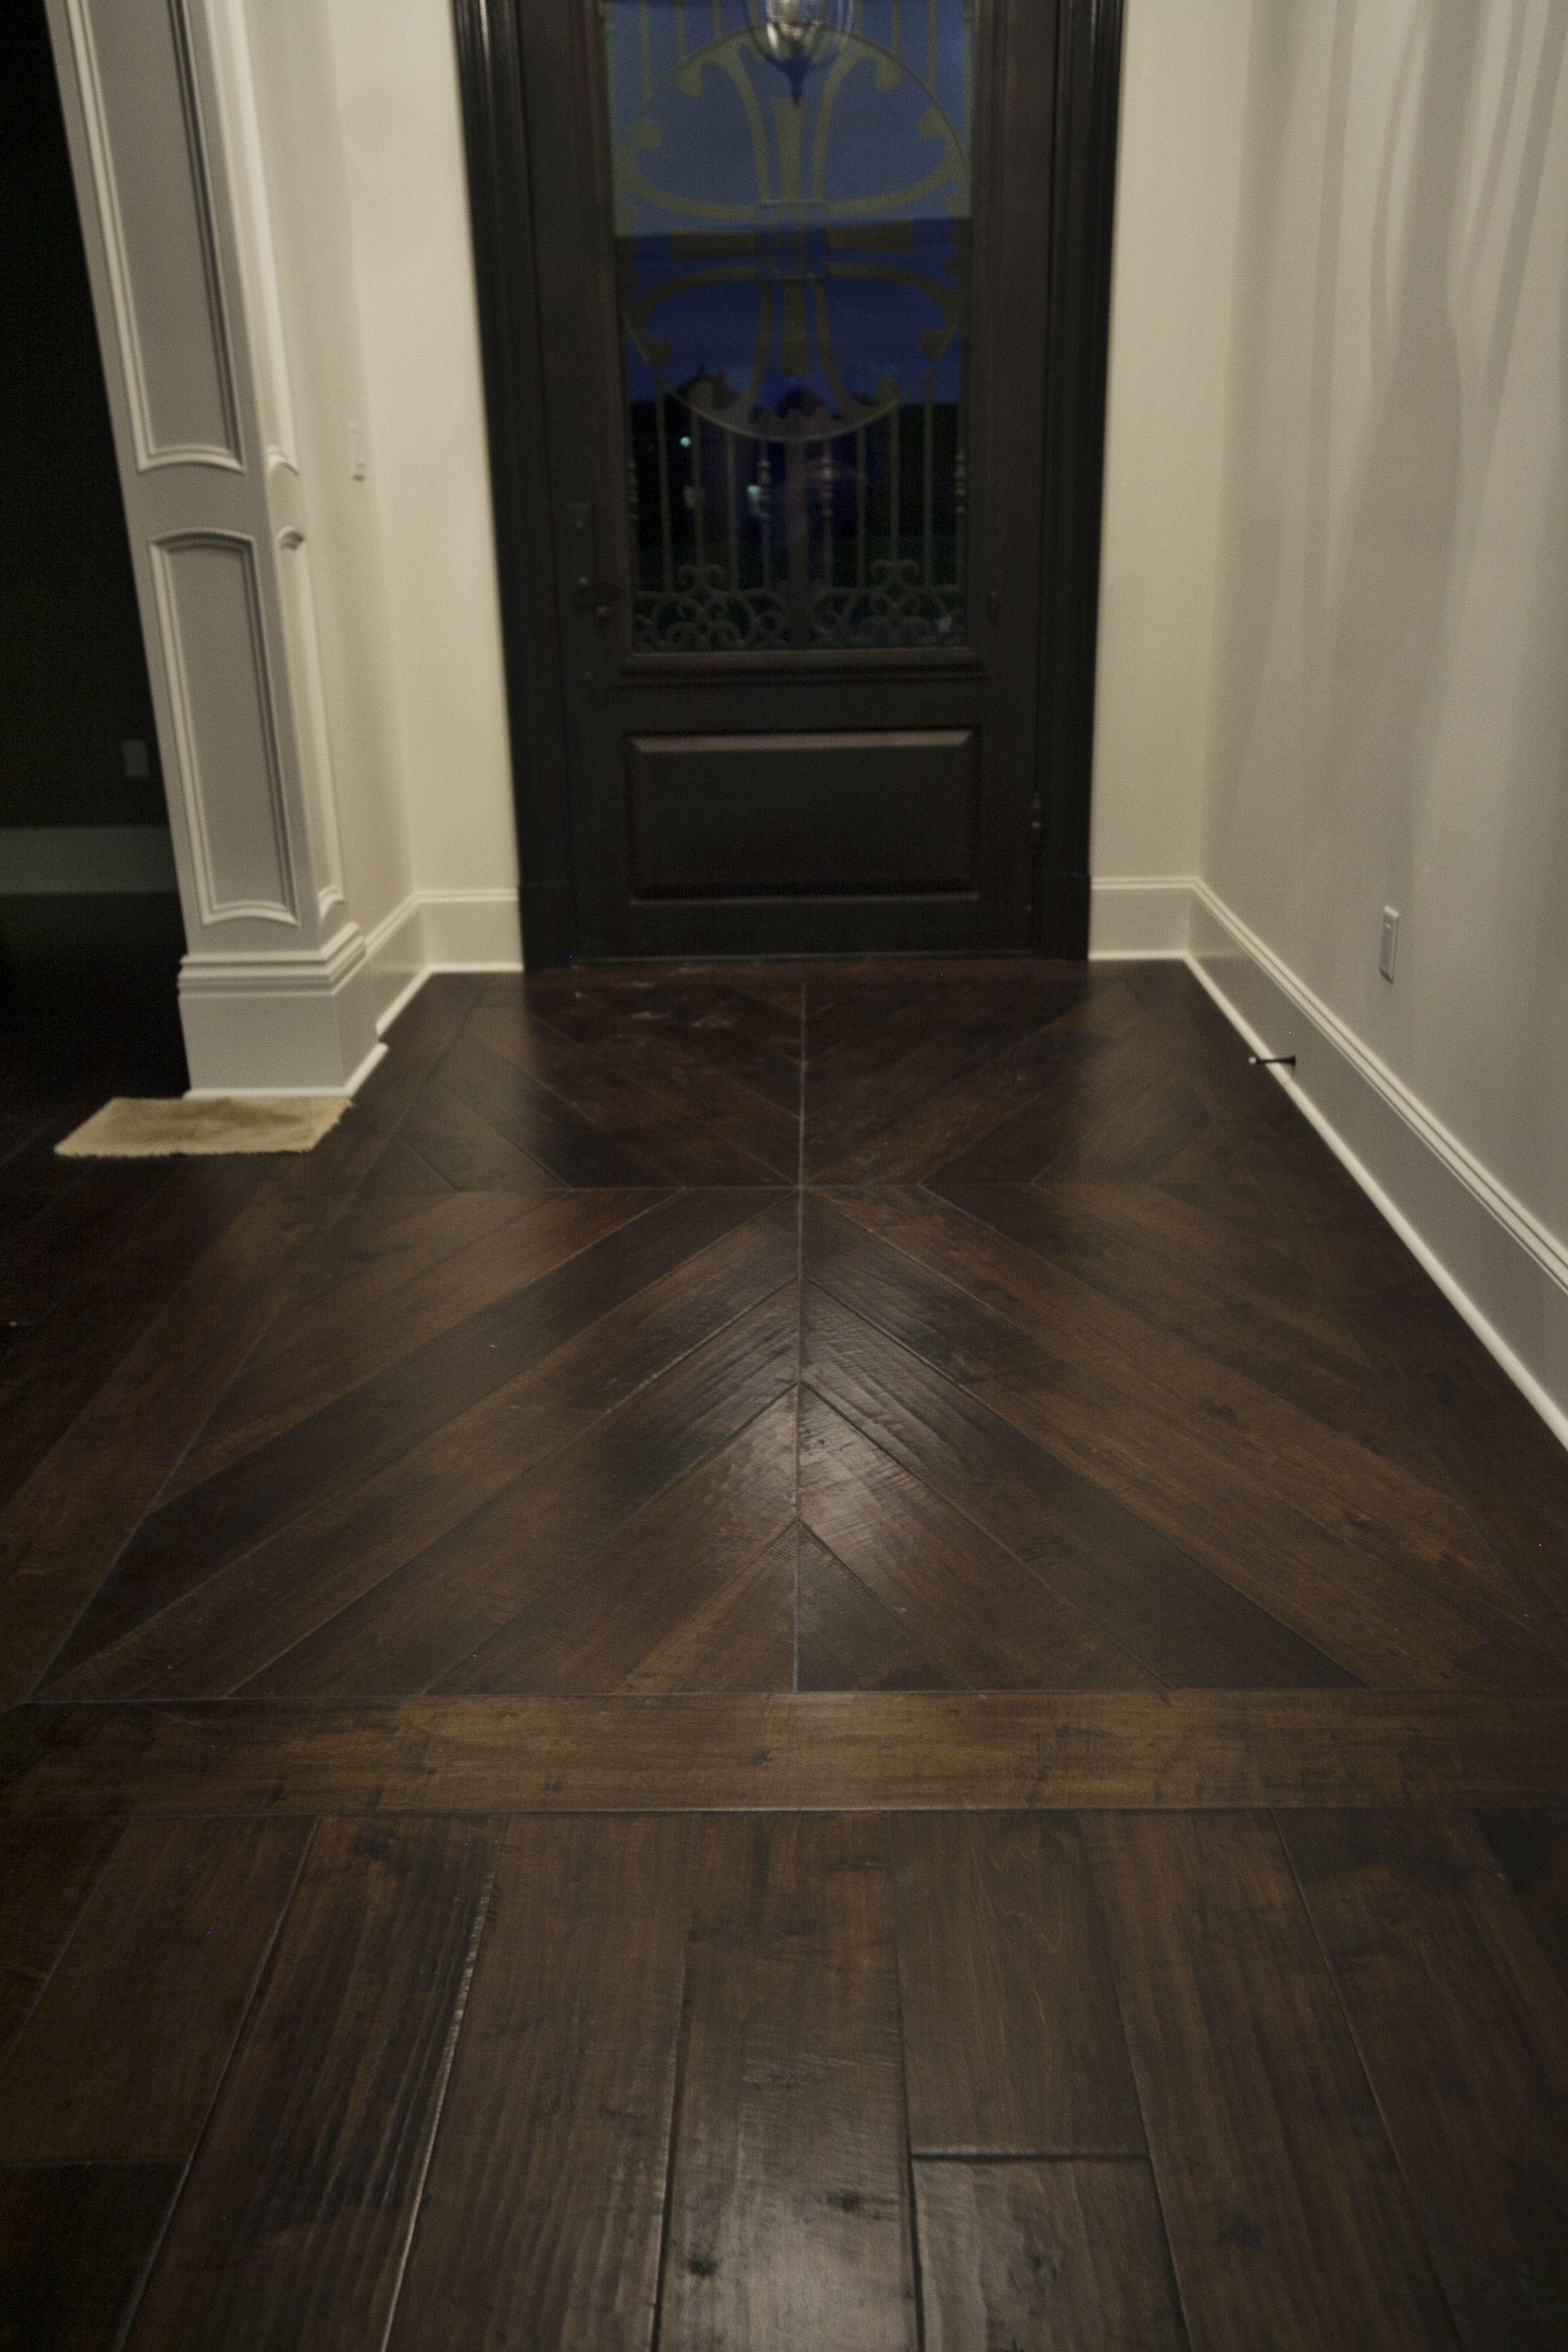 Hardwood Look Tile Floor Covering Assessments Absolute Best